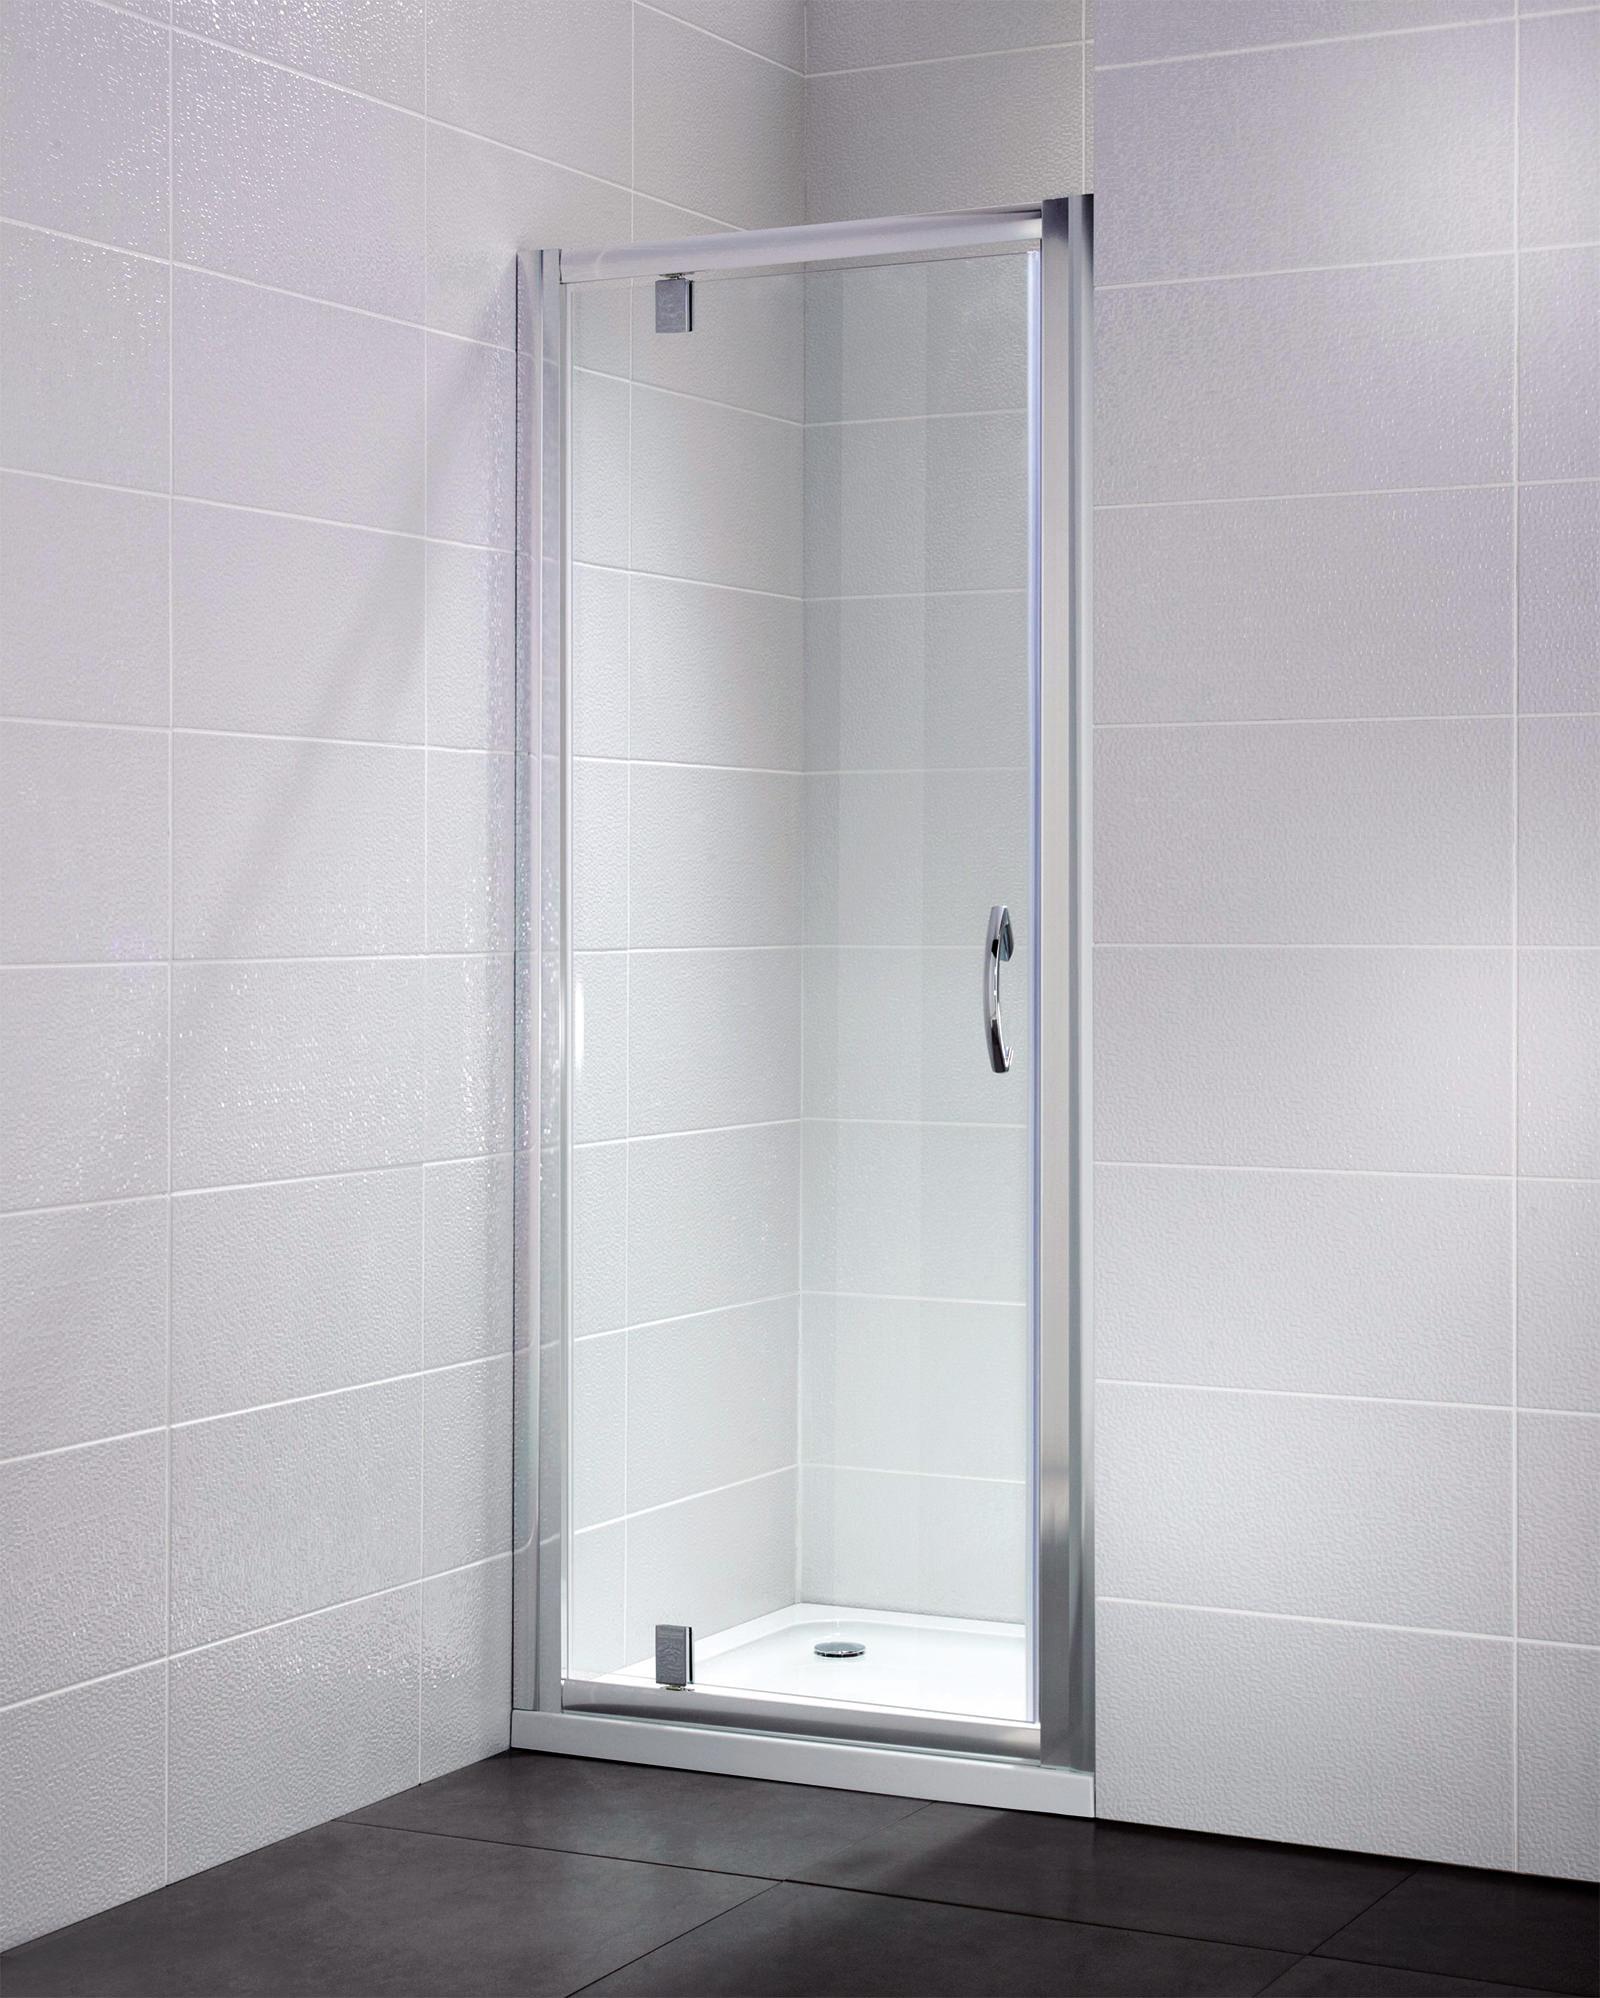 April Identiti2 1900mm High Pivot Shower Door